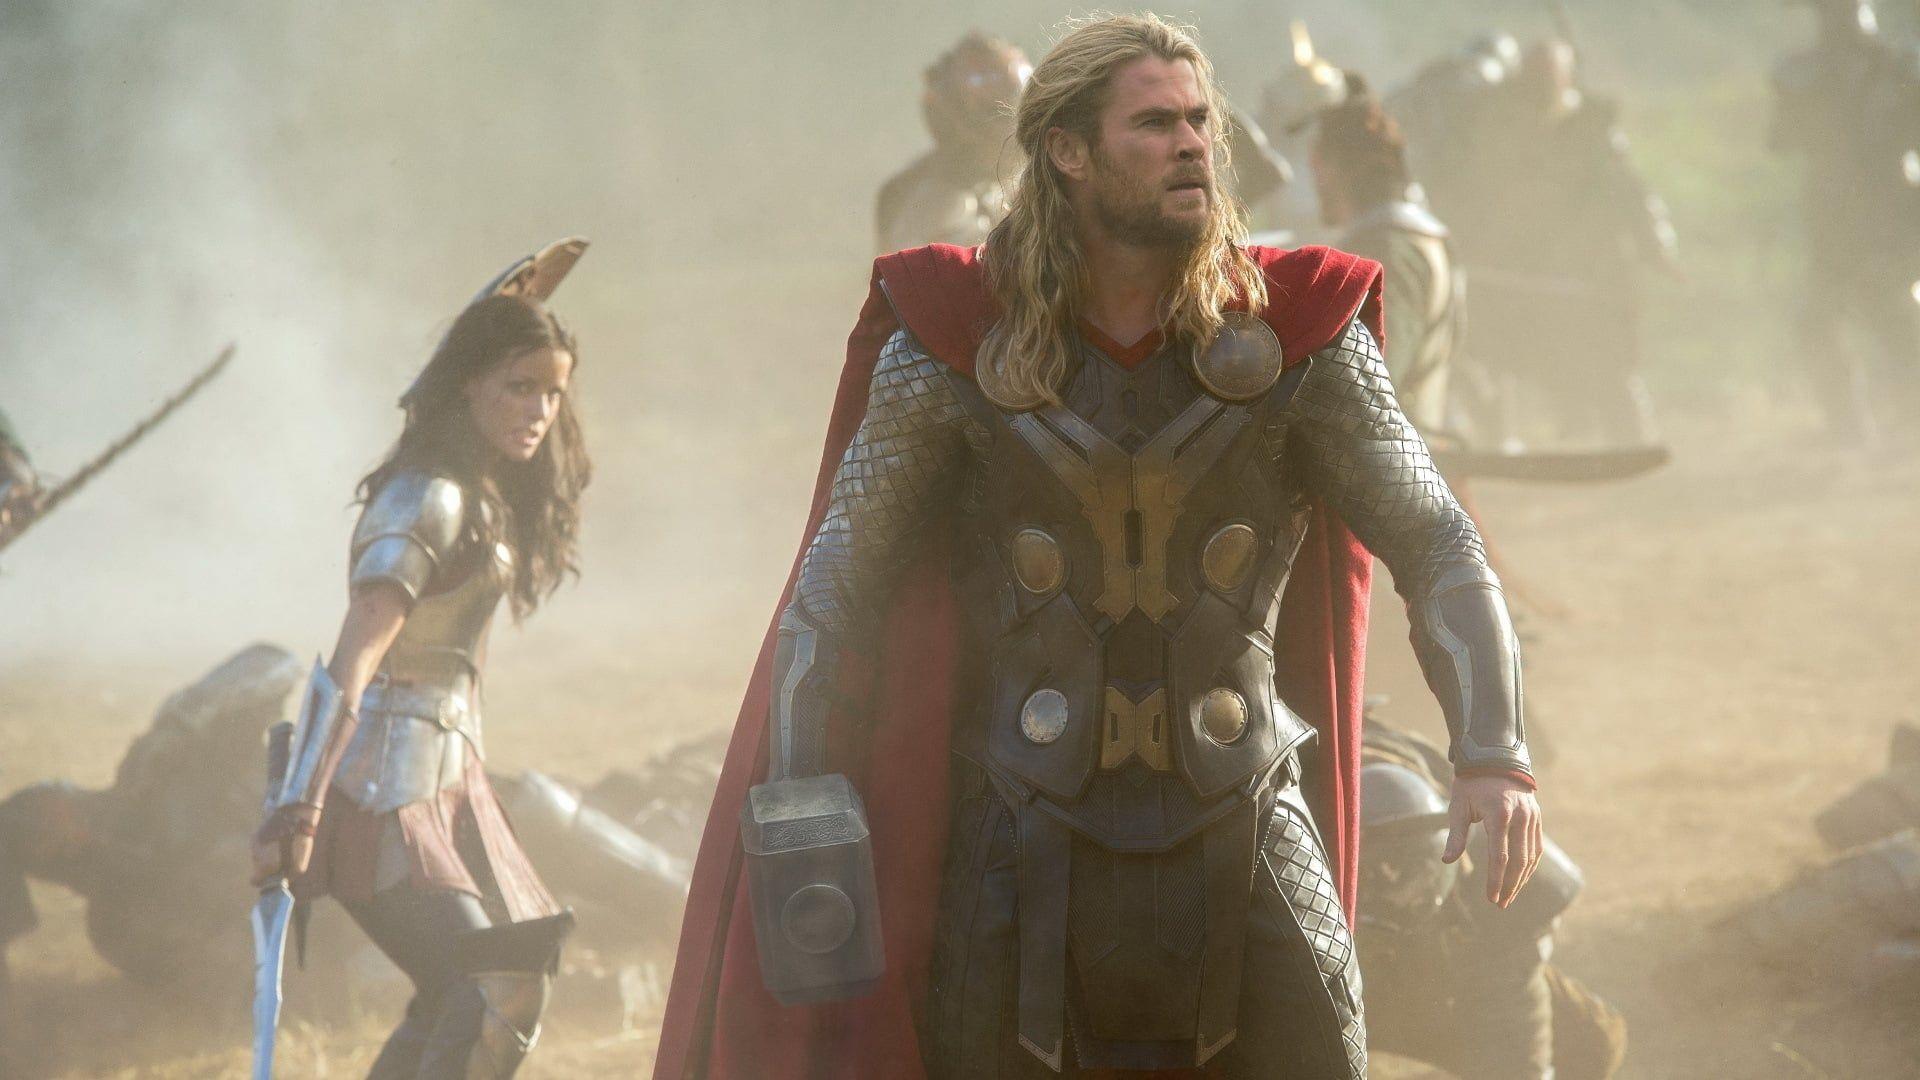 Thor The Dark Kingdom 2013 Ganzer Film Stream Deutsch Komplett Online Thor The Dark Kingdom 2013complete Film Deutsch Thor Thor The Dark World Watch Thor